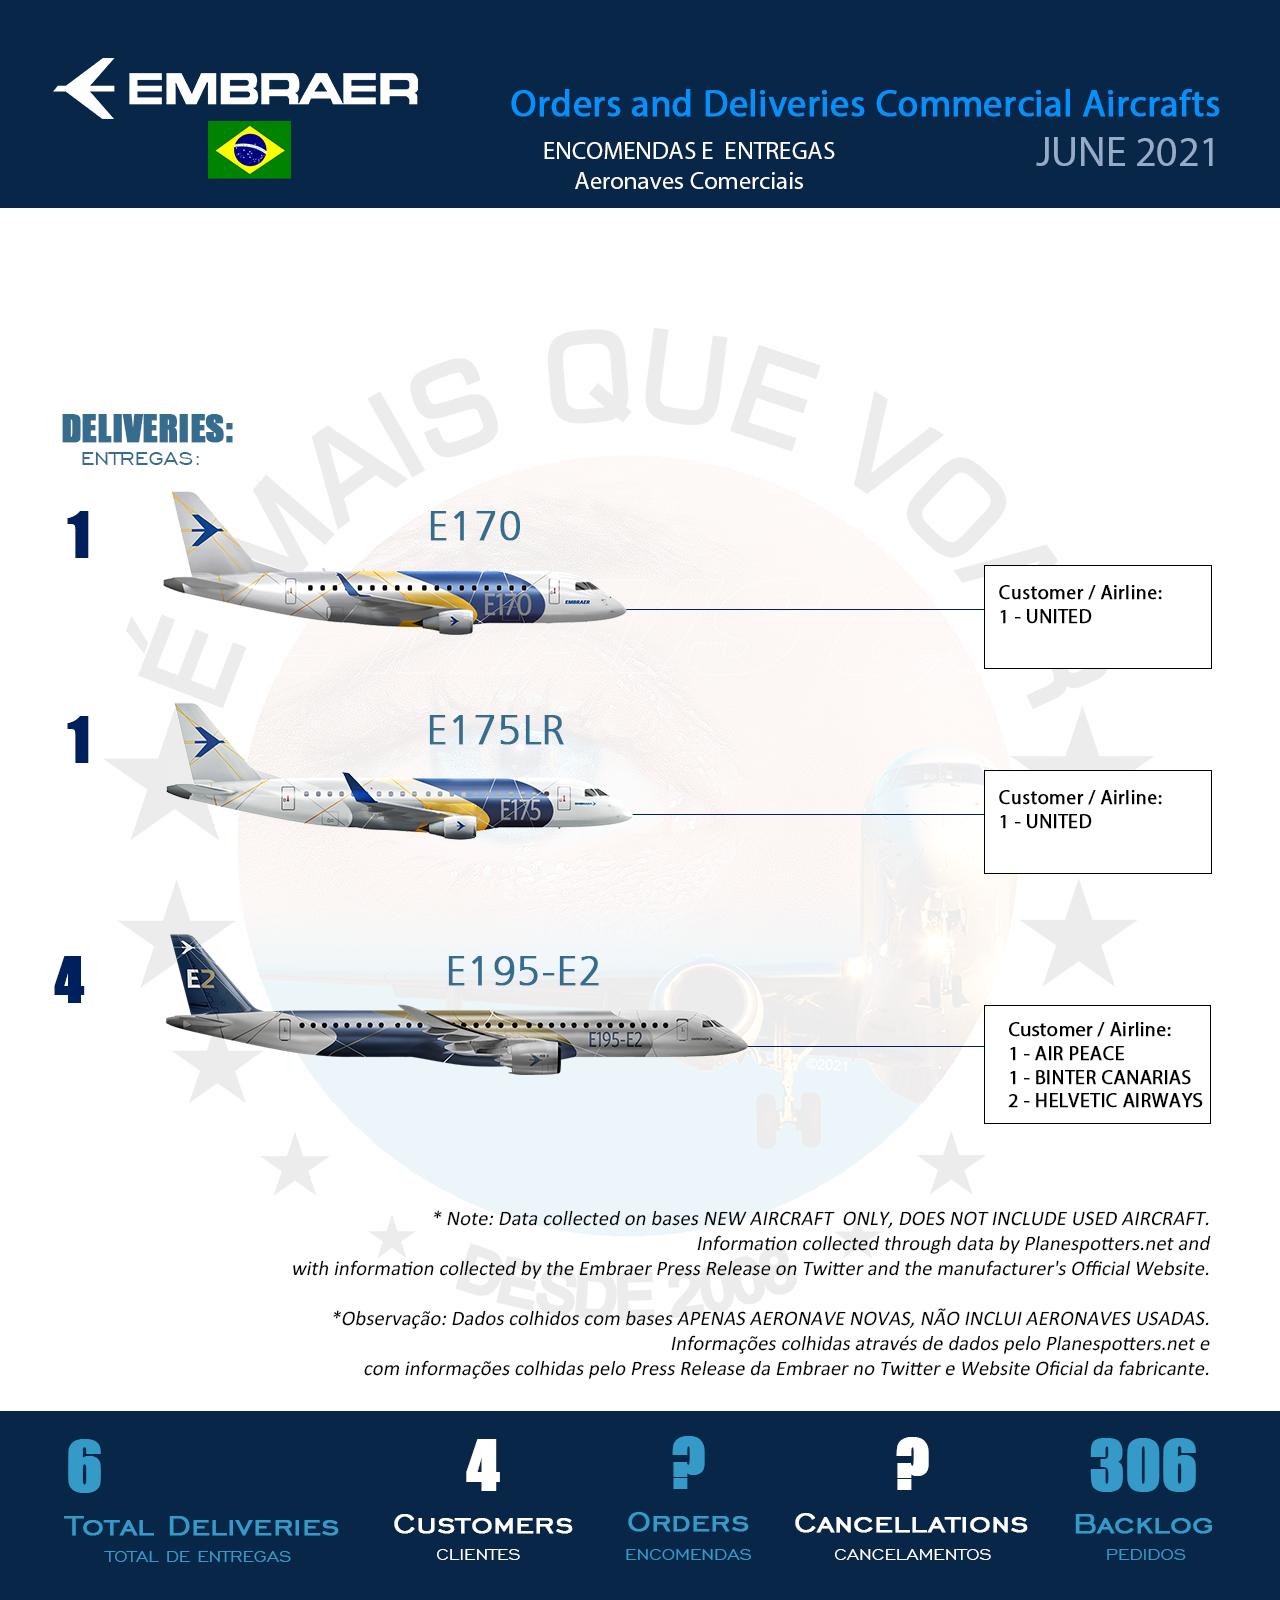 Infográfico: Encomendas e Entregas Aeronaves Comerciais da Embraer (EMBR3) – Junho 2021